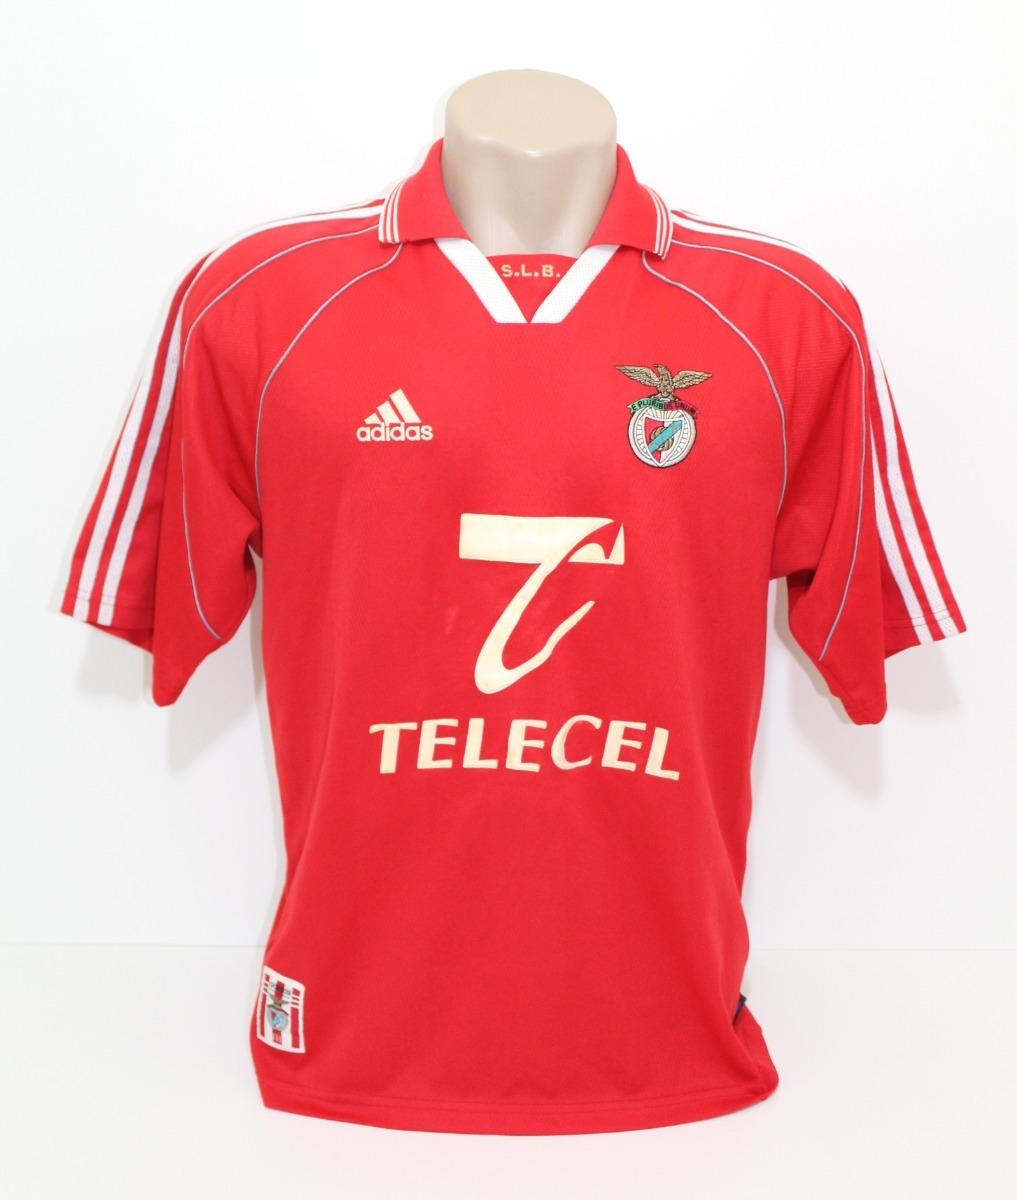 Camisa Original Benfica 1999 2000 Home adidas - R  220 ba9d3f33d571d